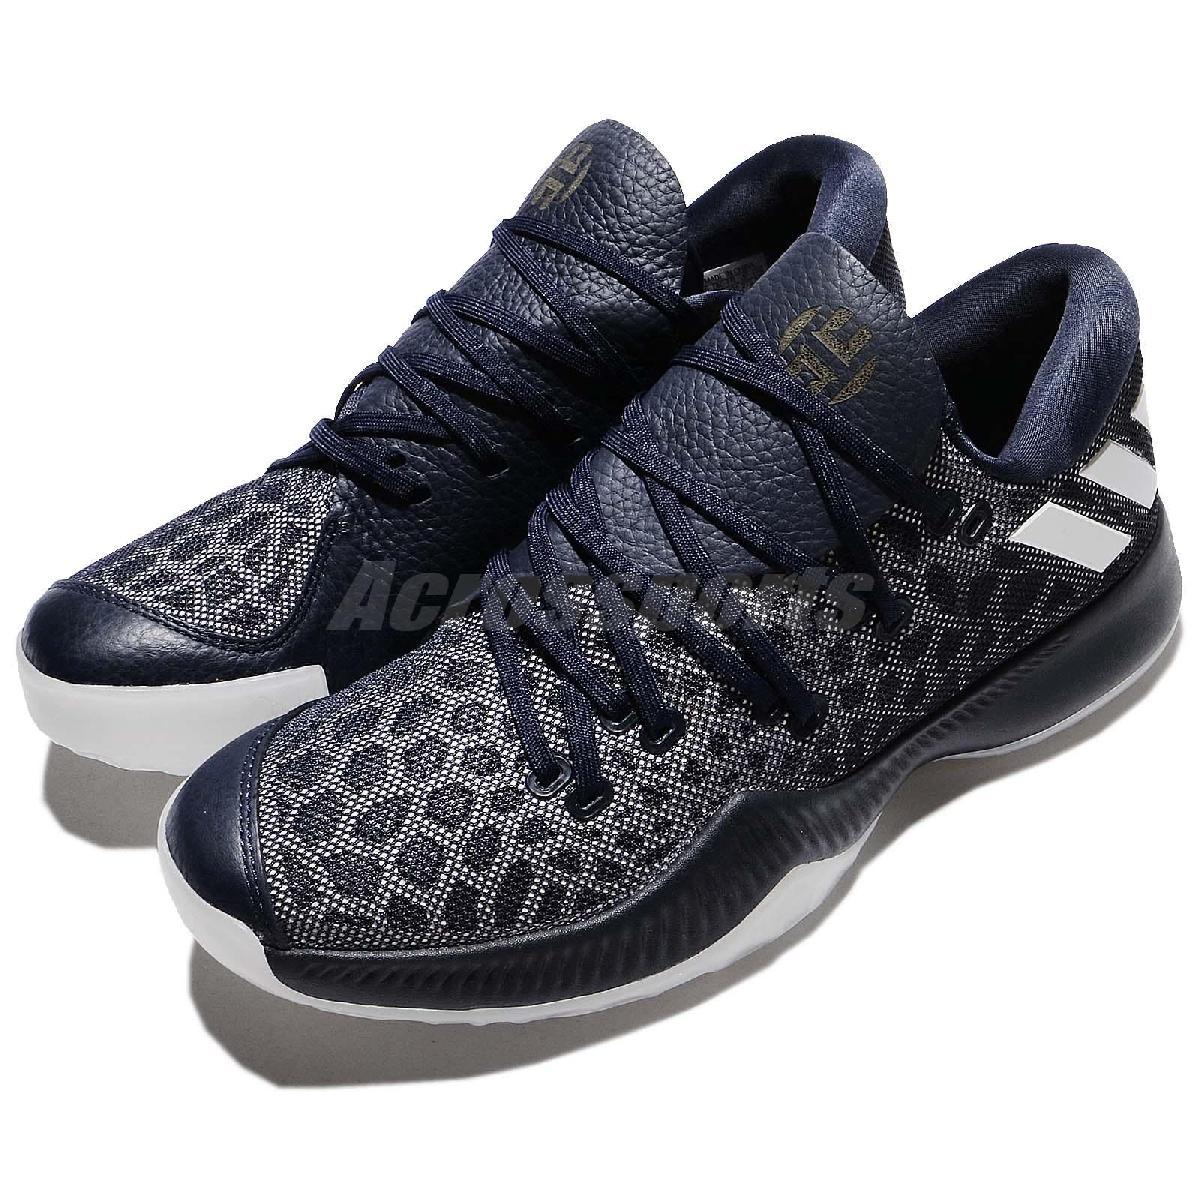 adidas 籃球鞋 Harden B/E 藍 白 平民版 低筒 舒適緩震 運動鞋 男鞋【PUMP306】 CG4195